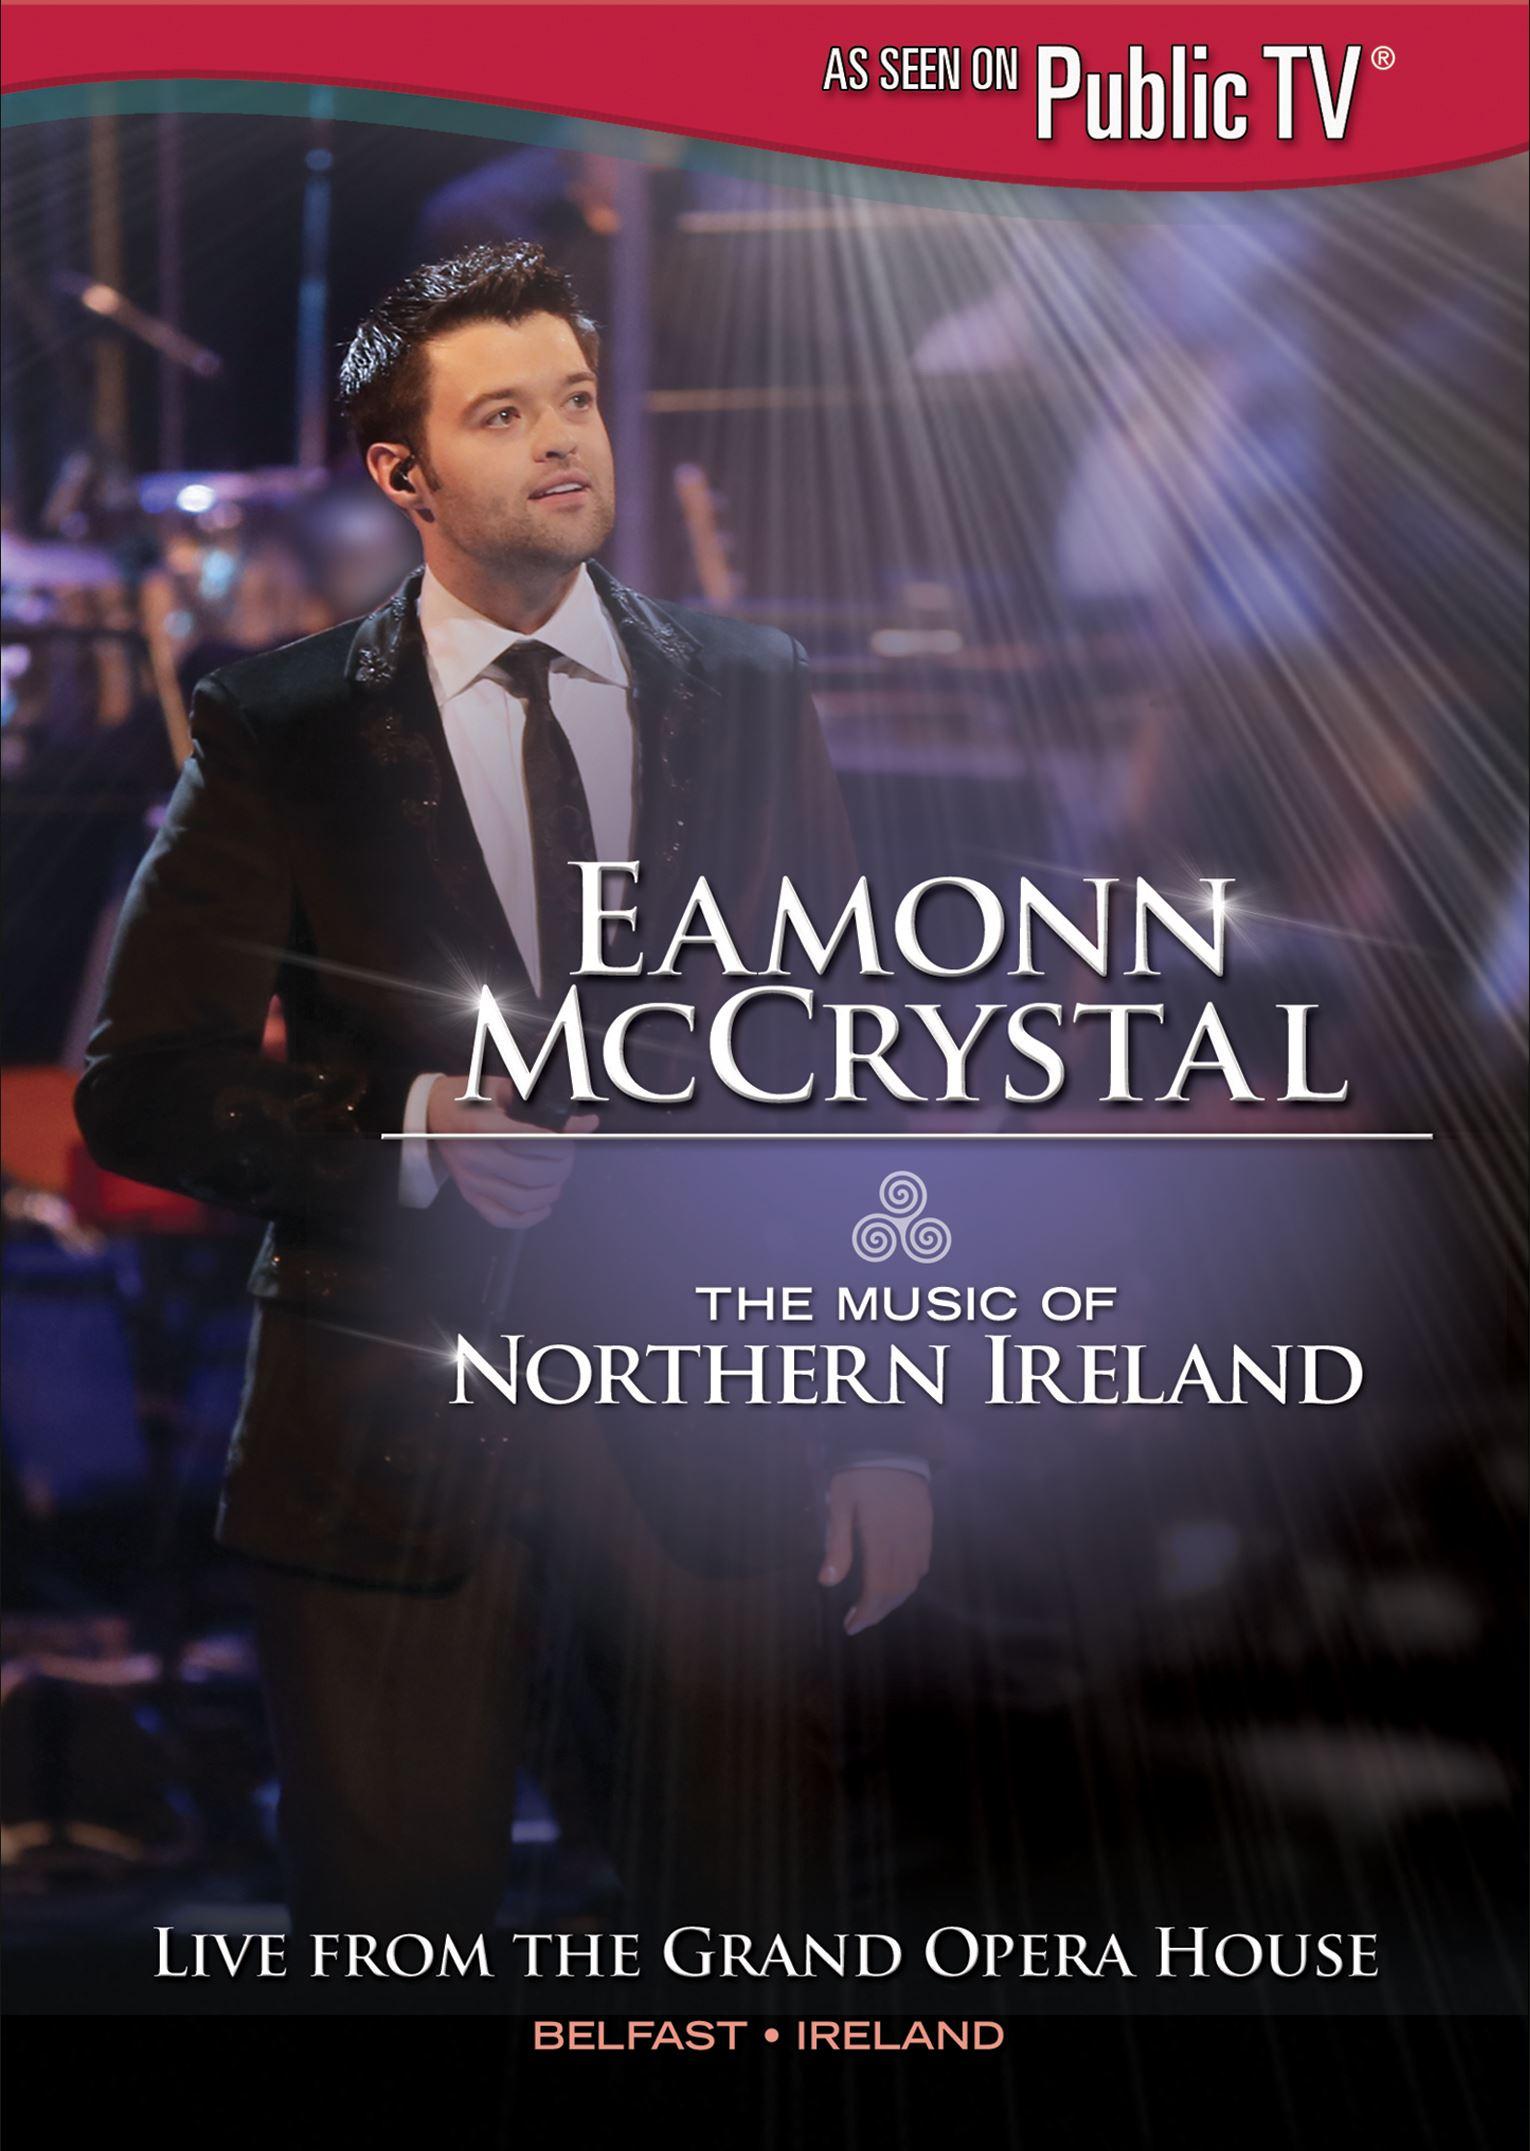 Eamonn McCrystal: The Music of Northern Ireland